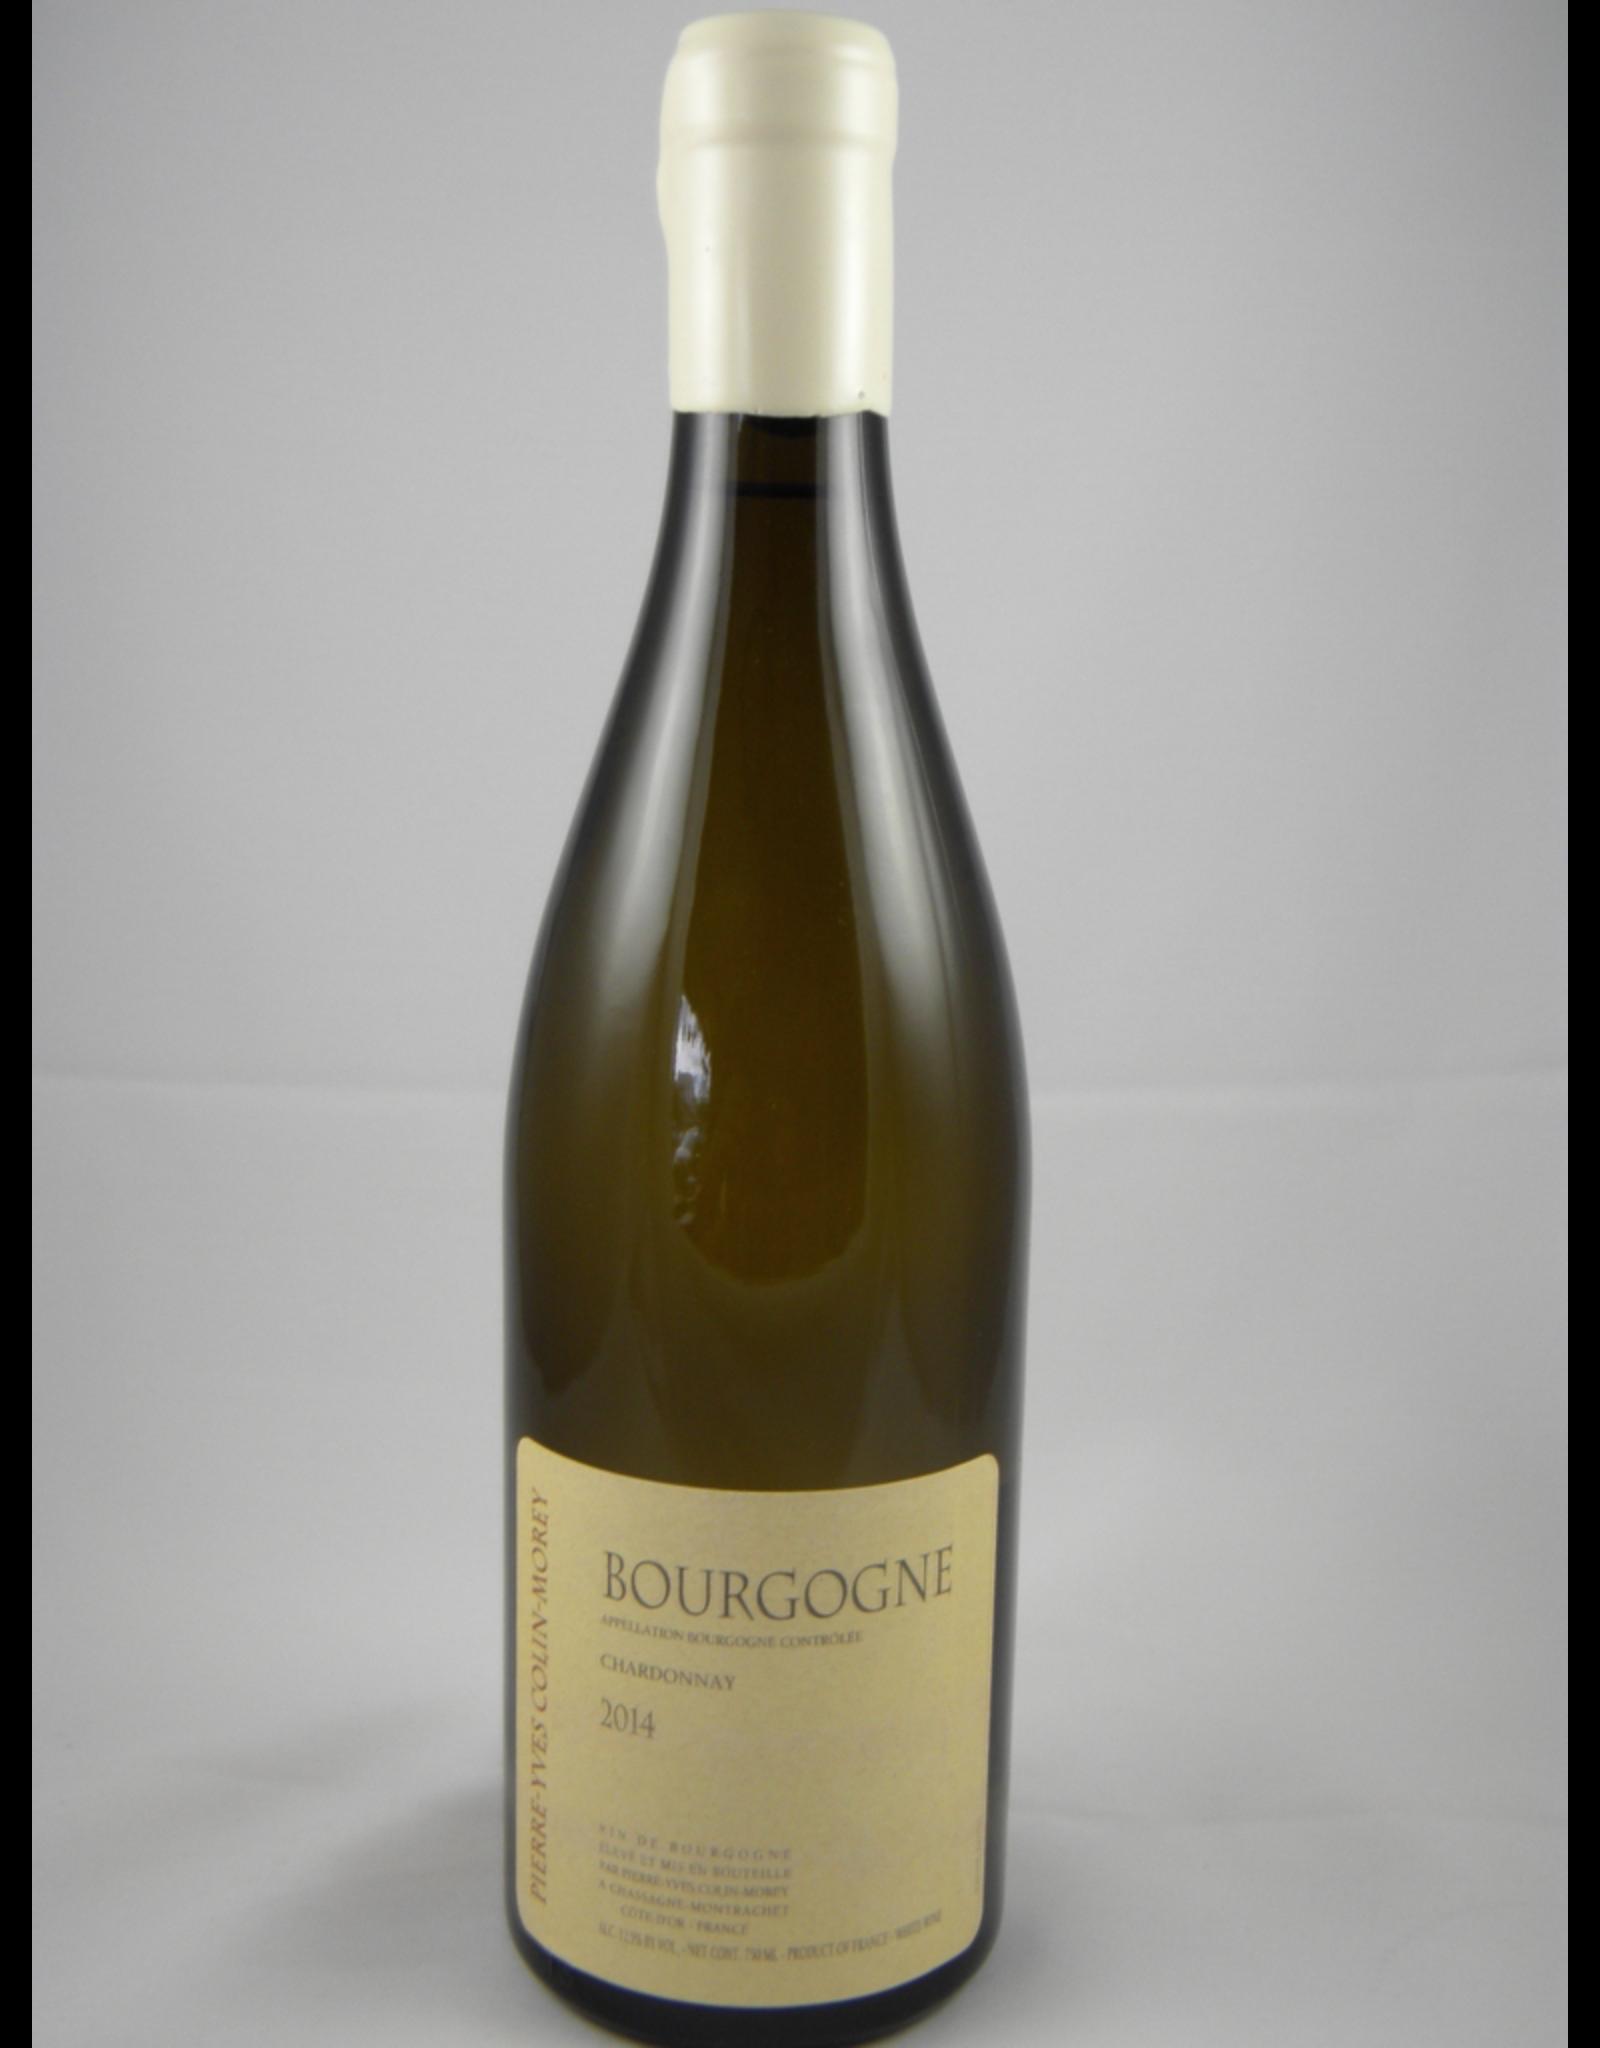 PYCM Pierre Yves Colin Morey Bourgogne Blanc 2019